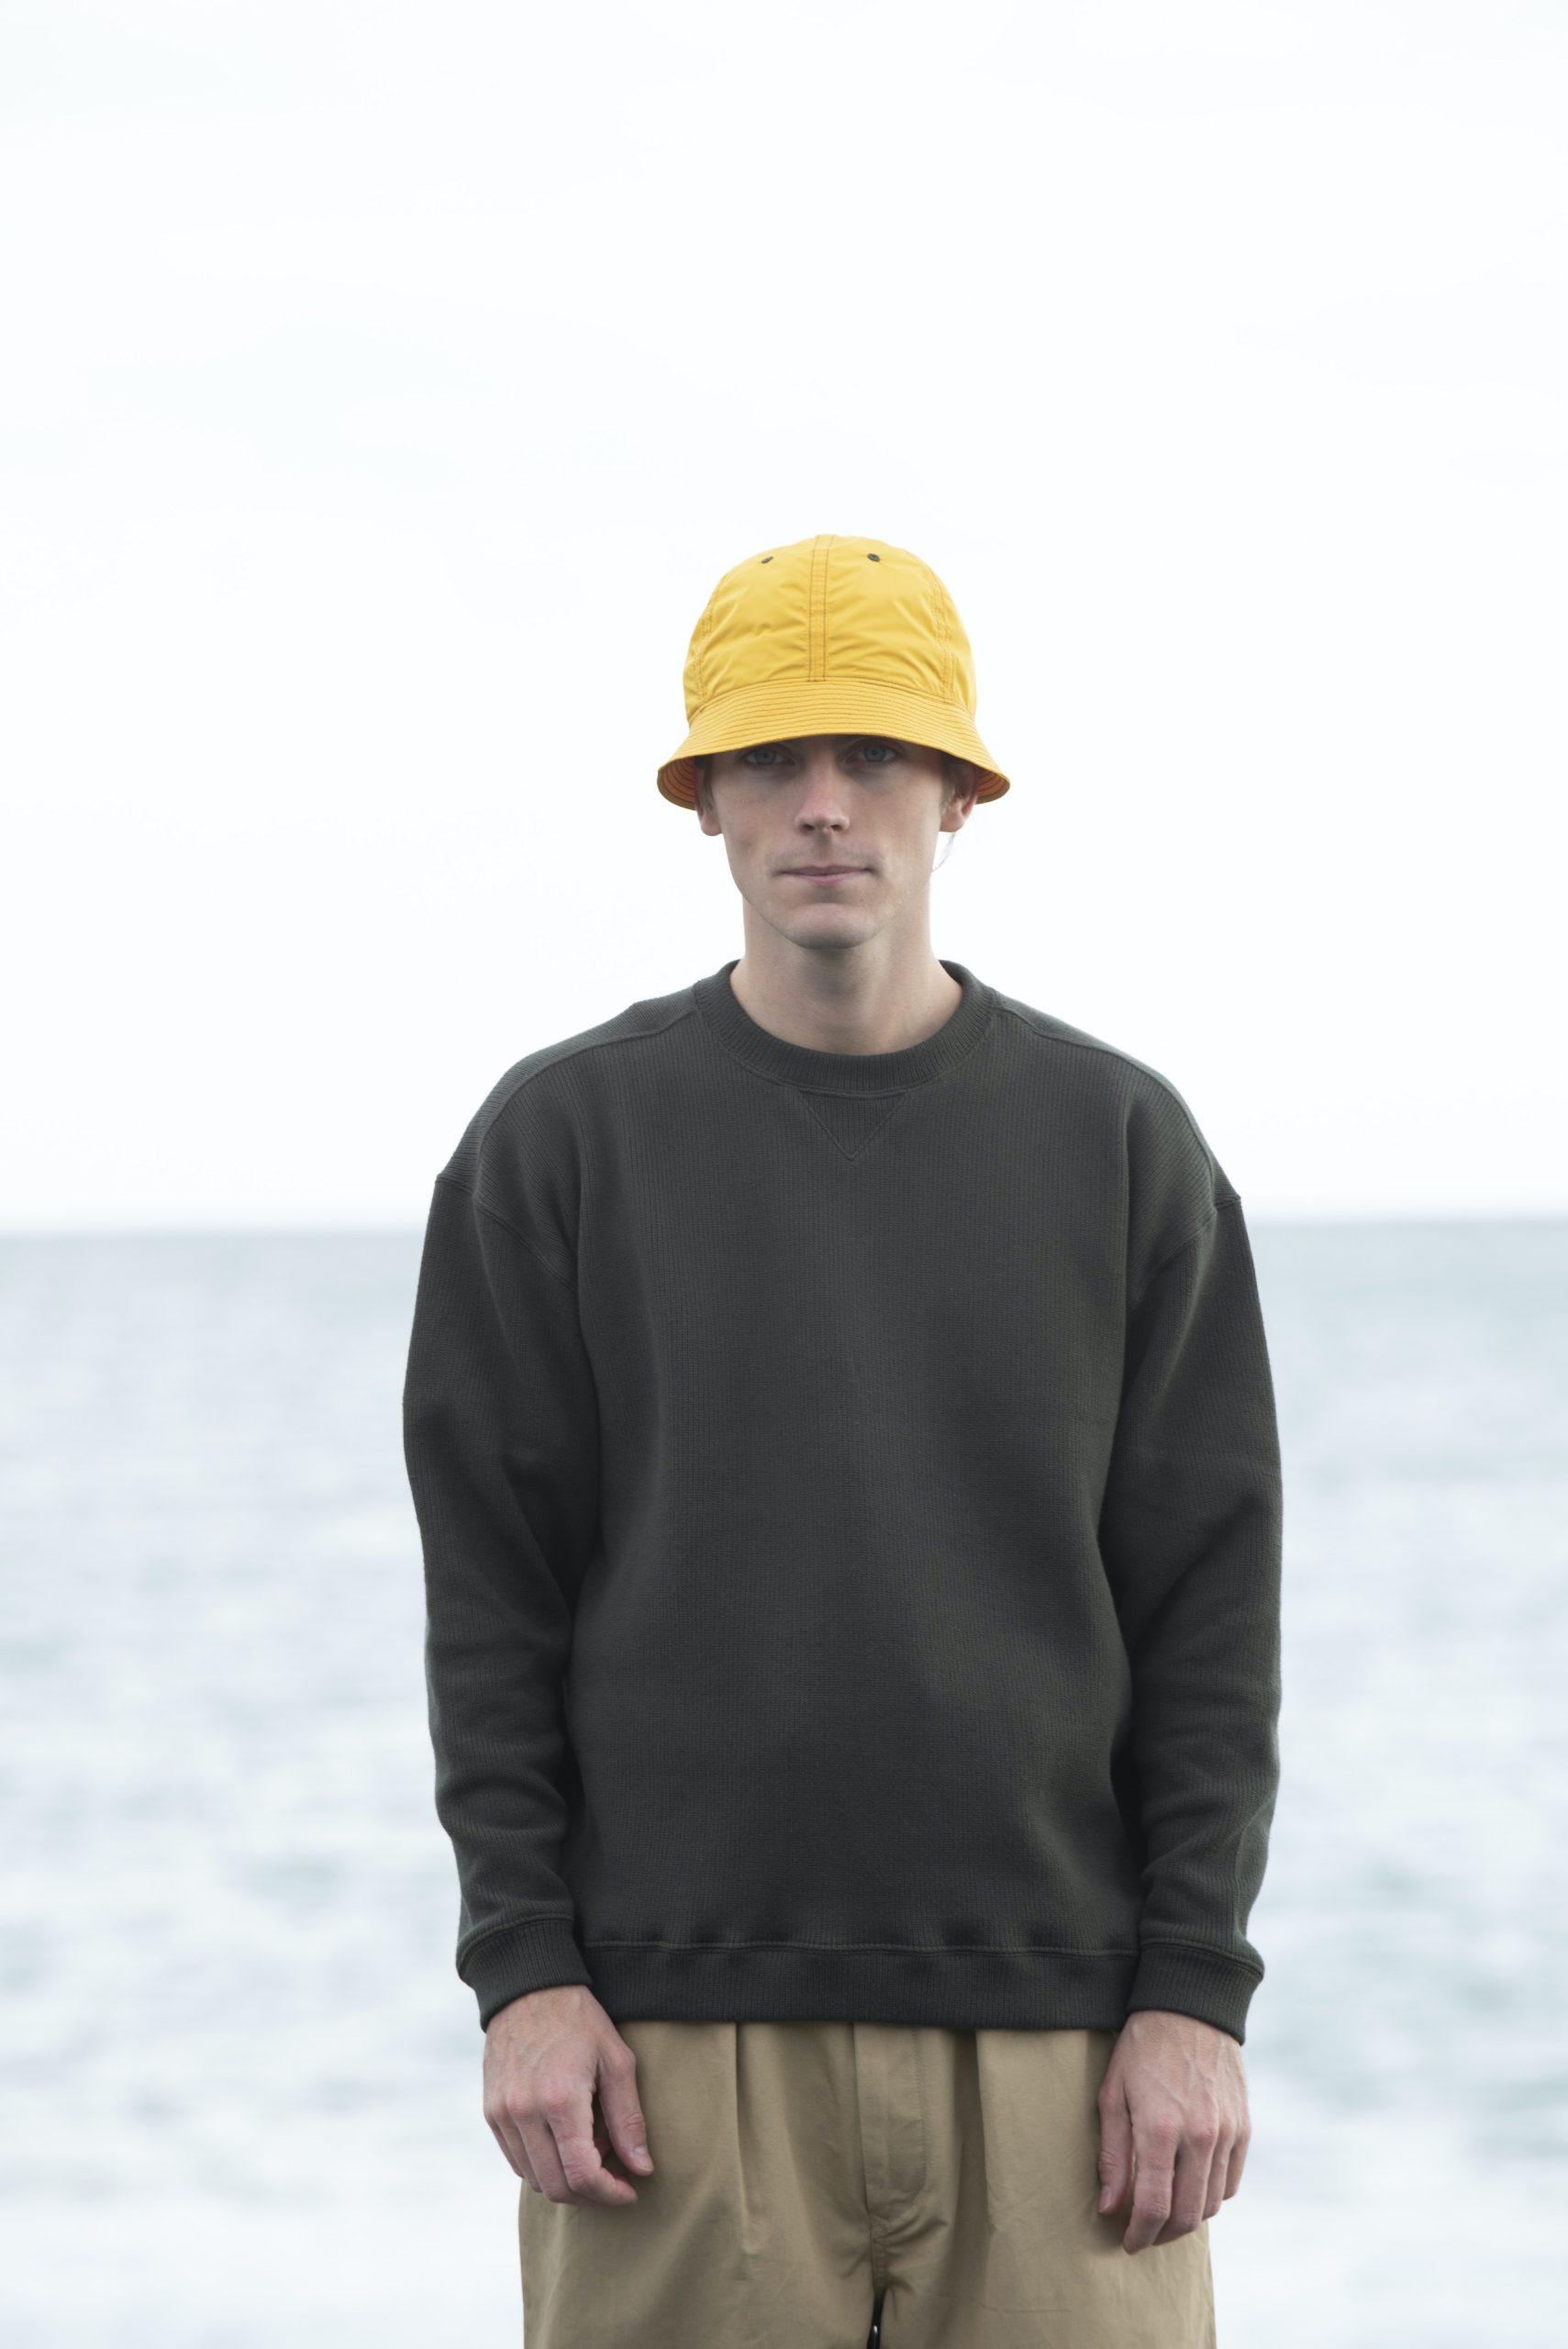 NOROLL 2020 DETOURS HAT